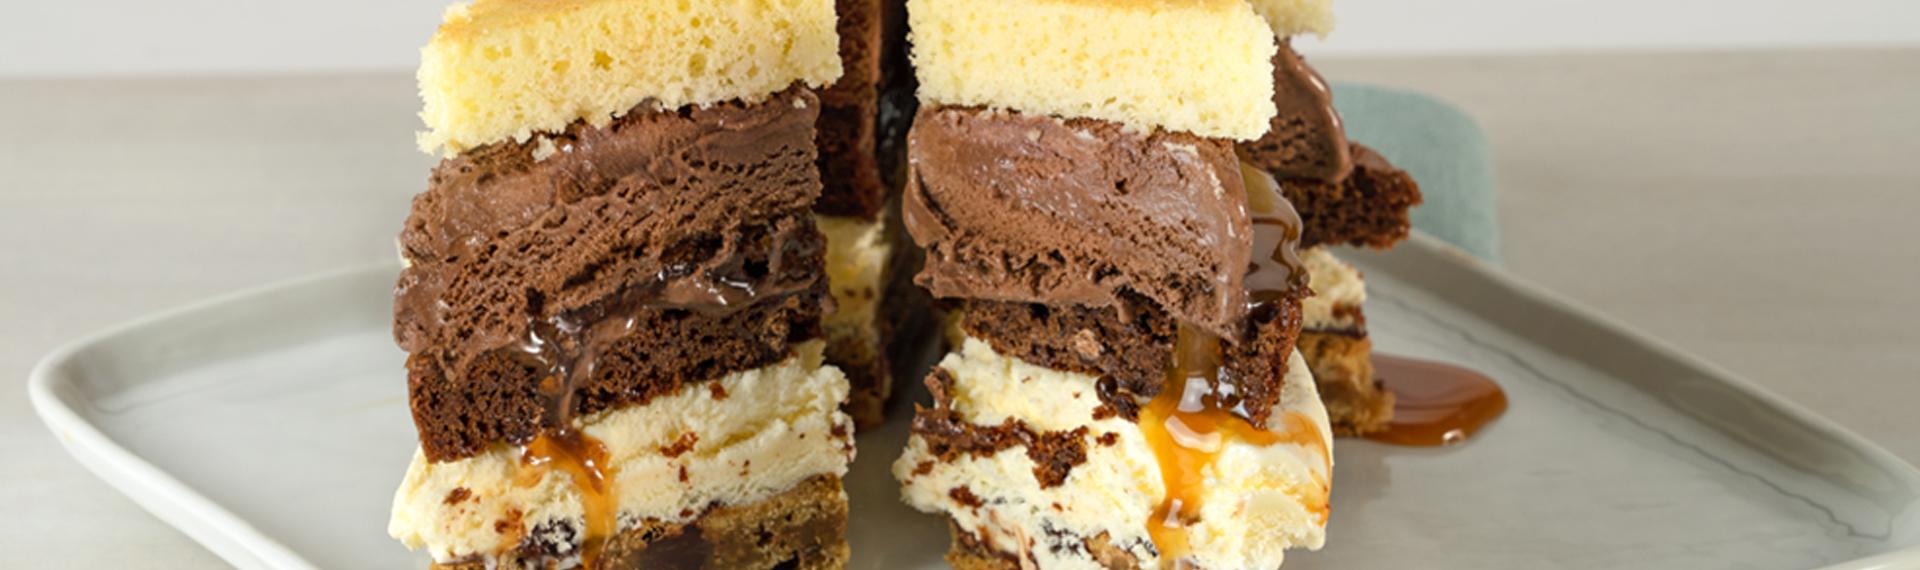 Chocolate Club Sandwich